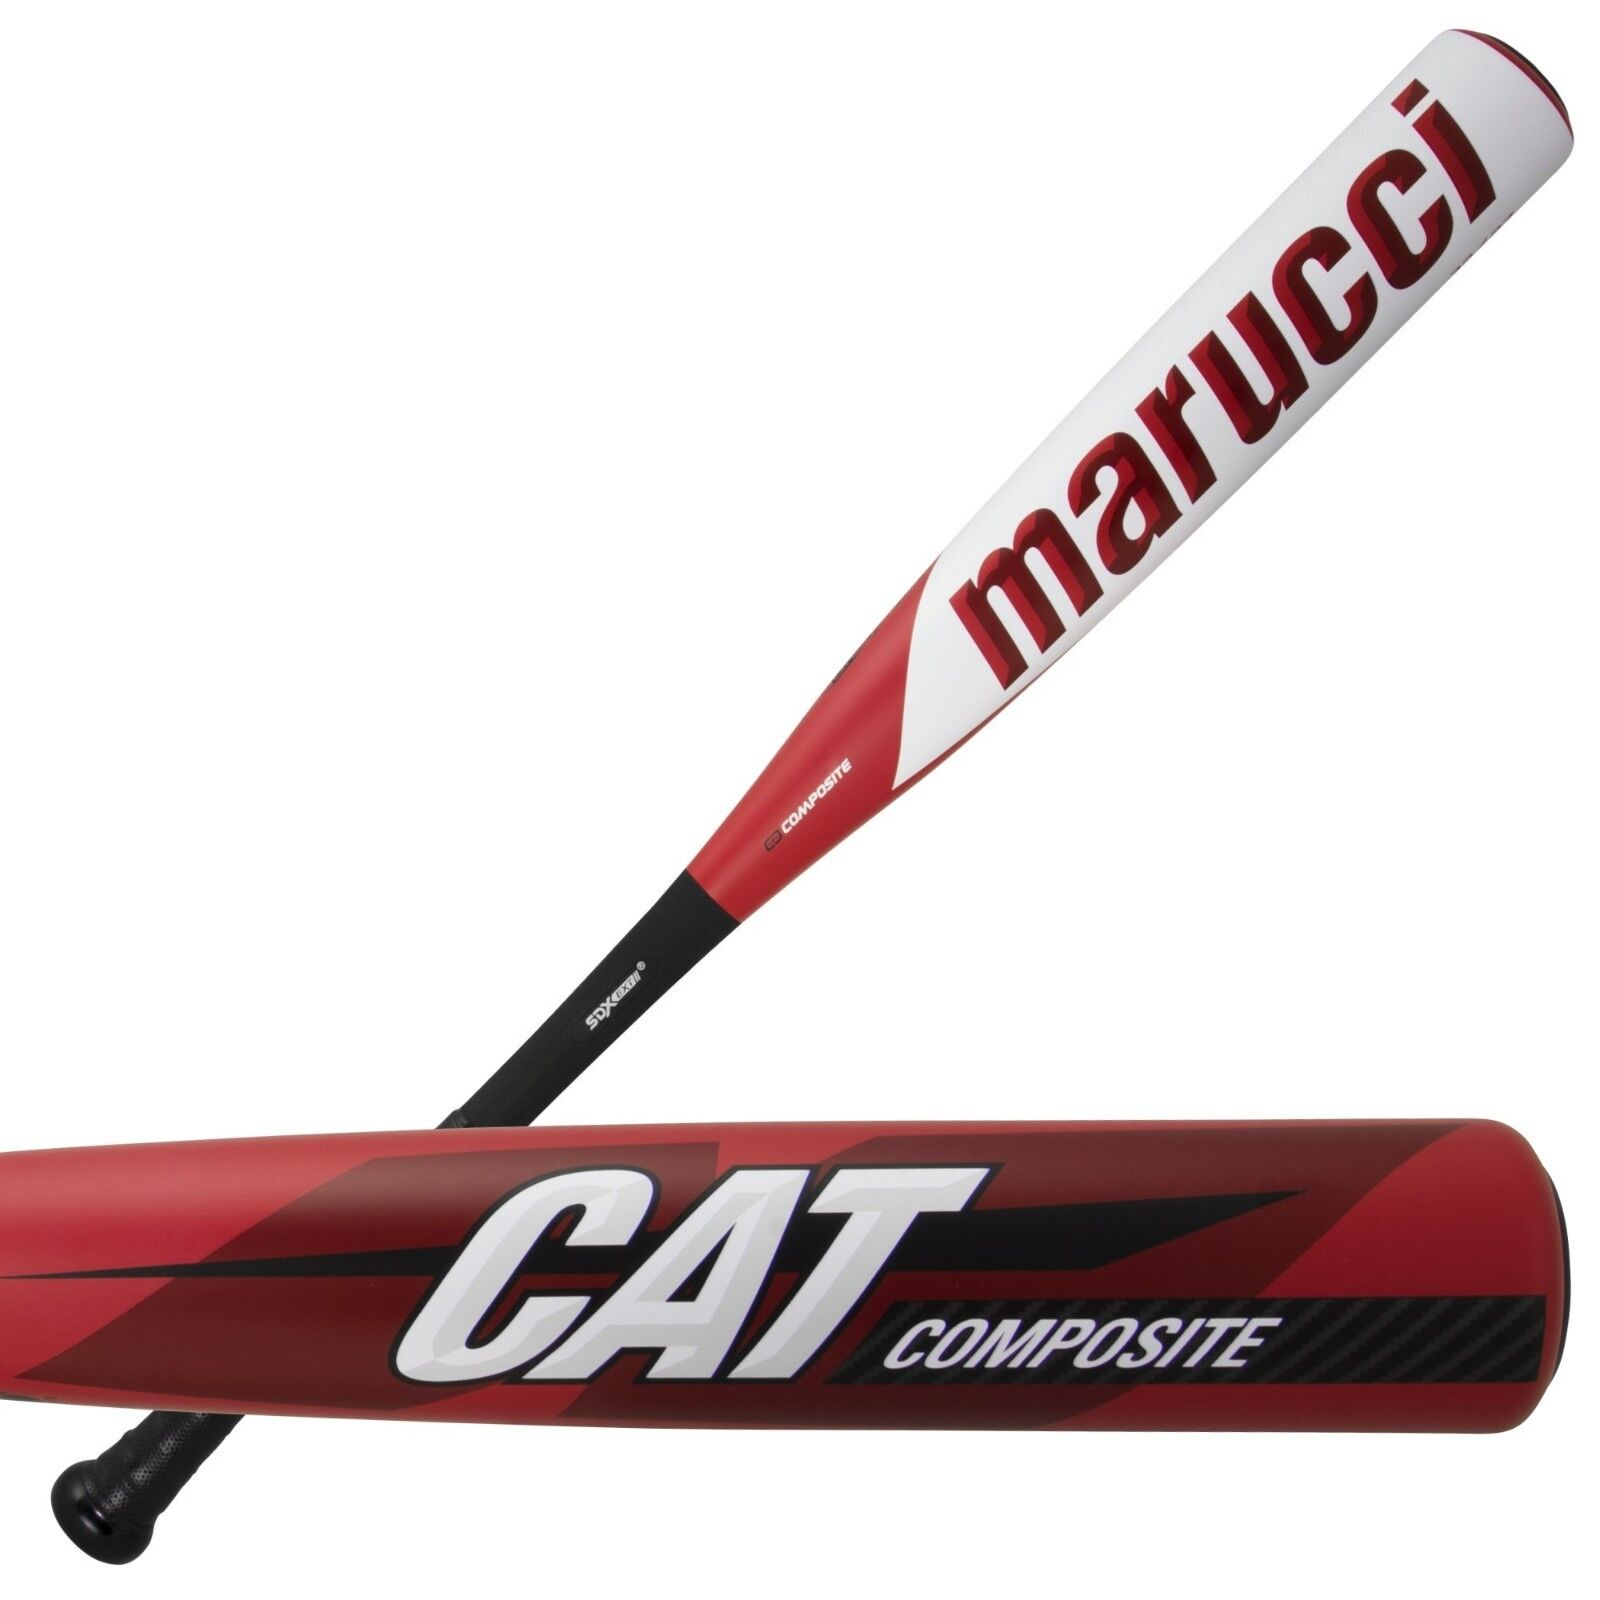 2019 Marucci CAT Composite -10 29  19 oz. Youth USSSA Baseball Bat MSBCCP10